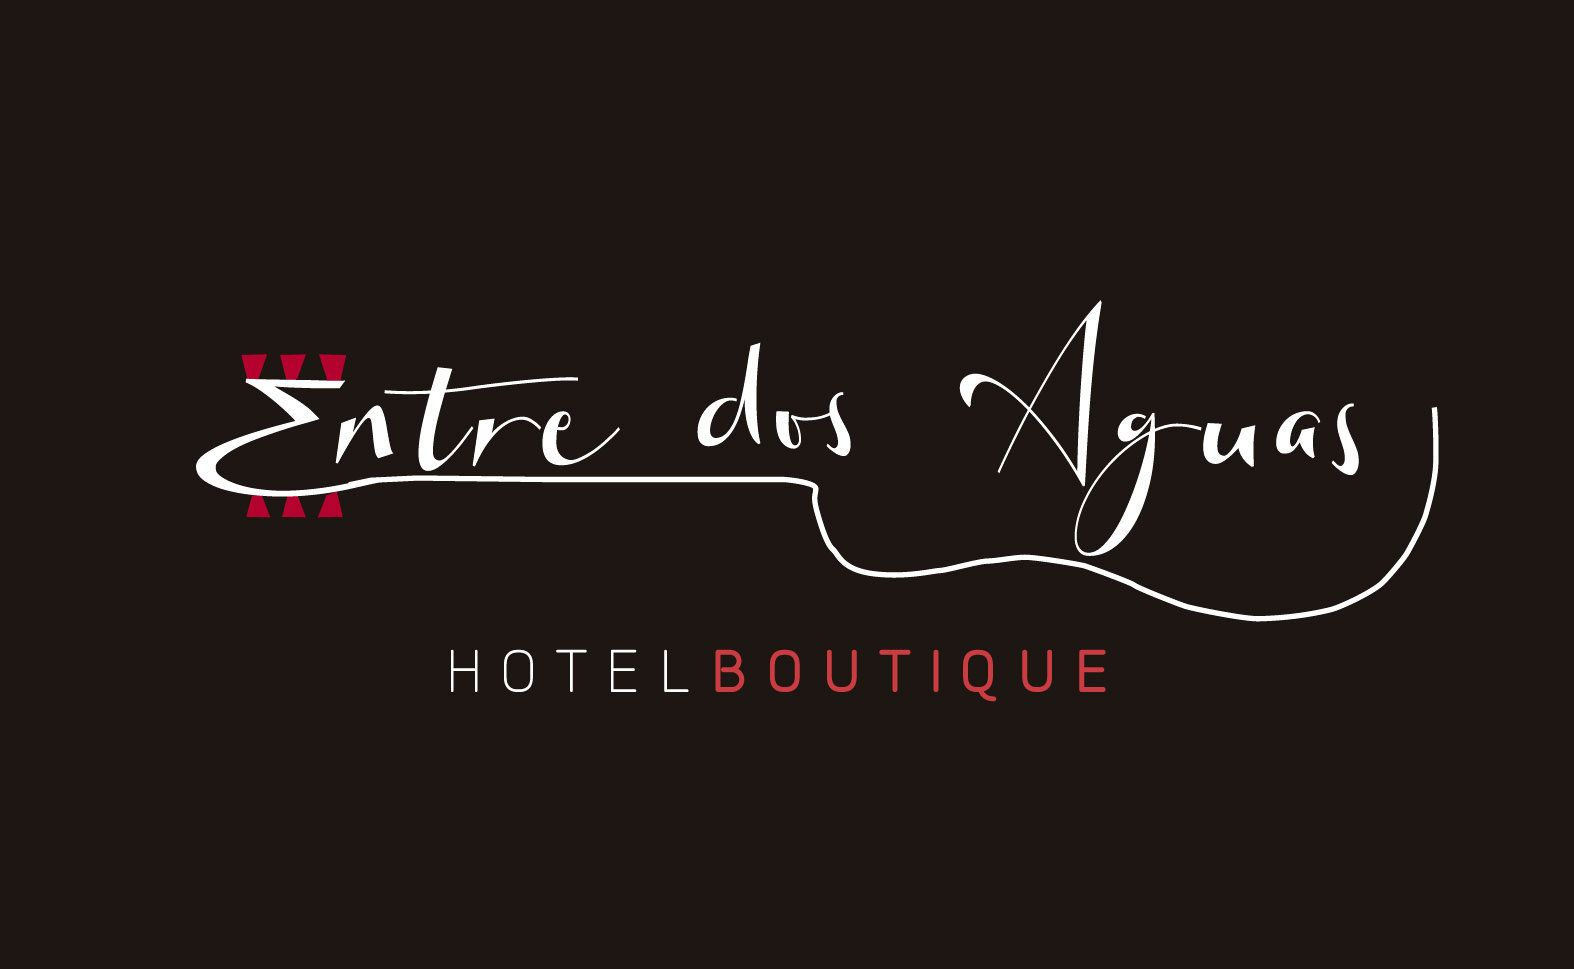 Entre Dos Aguas Hotel Boutique